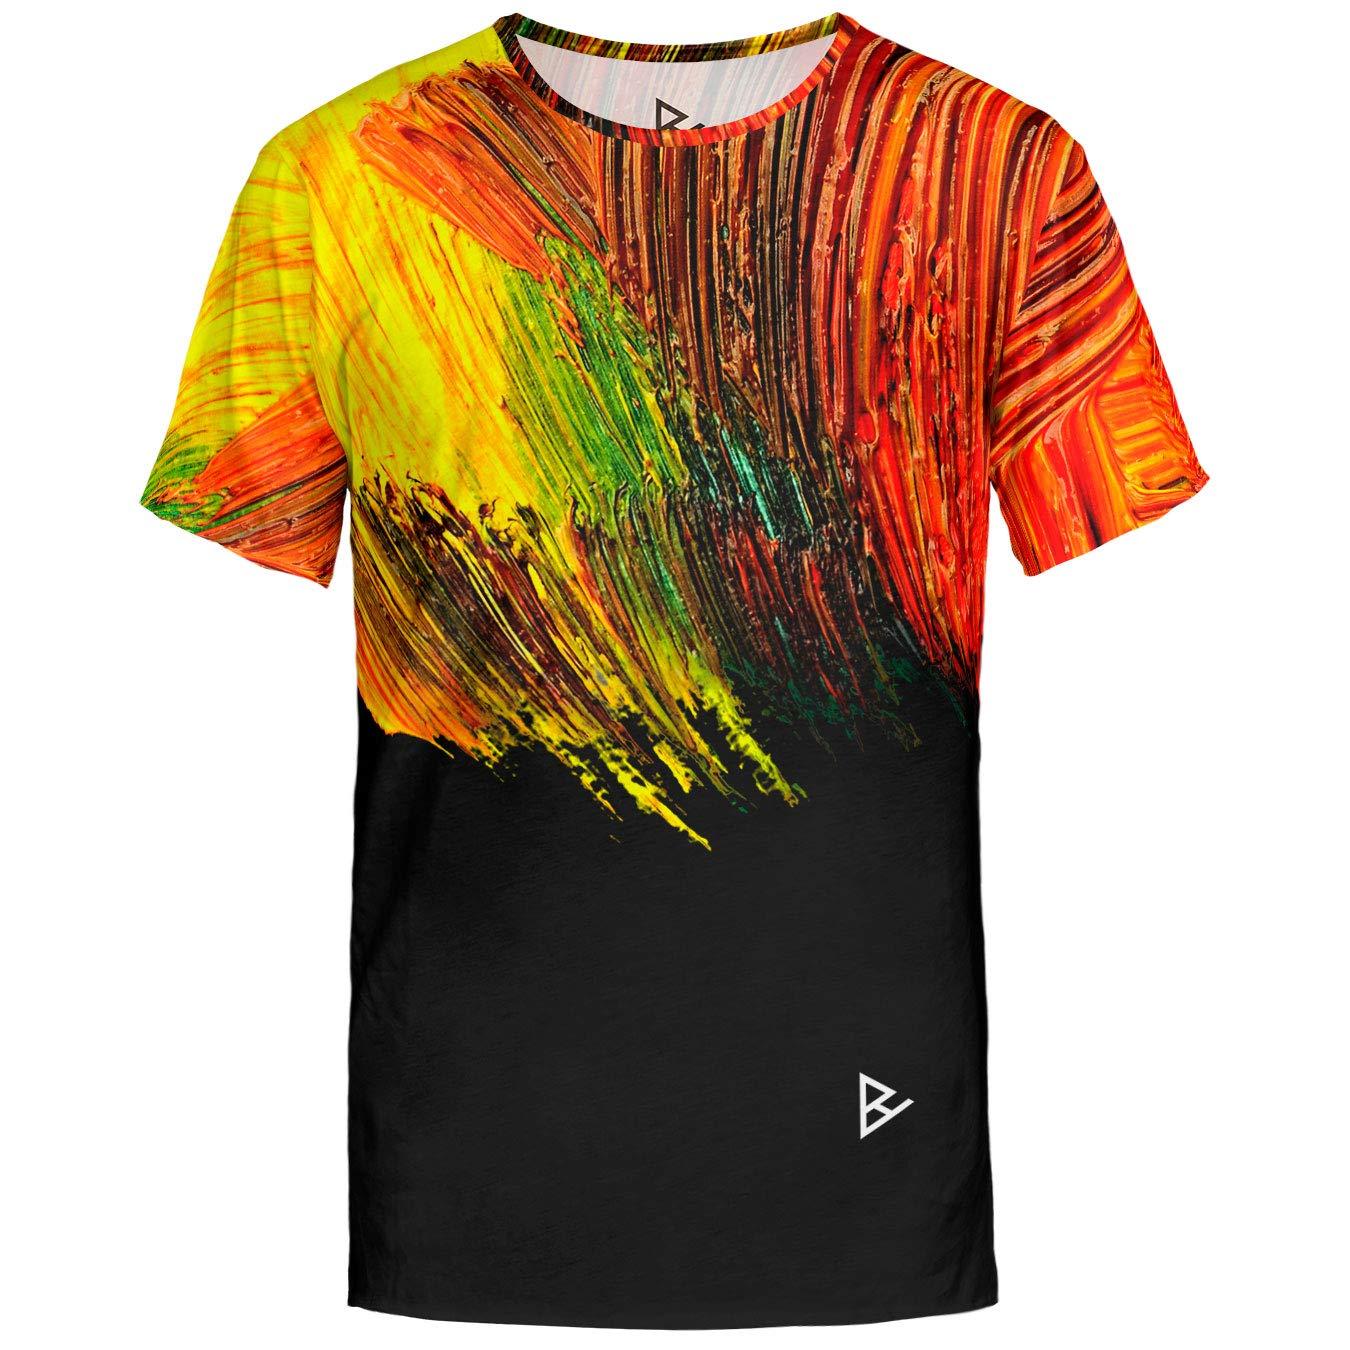 Blowhammer Blowhammer Blowhammer T-Shirt Herren - Scramb B071Z99RRM T-Shirts Hohe Qualität und geringer Aufwand 5ca7aa